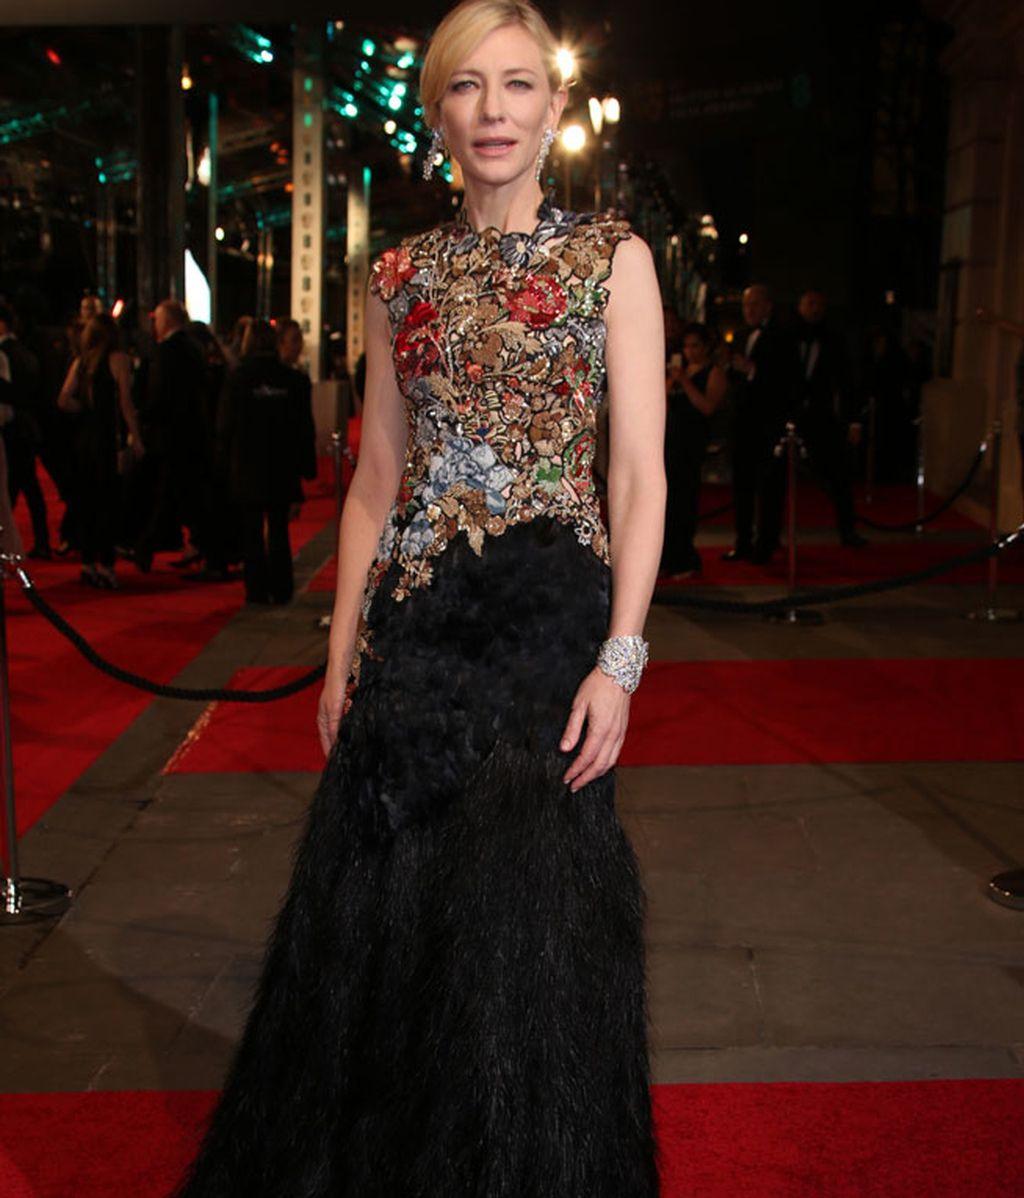 Cate Blanchett con un Alexander McQueen con flores de 'pailletes' y plumas